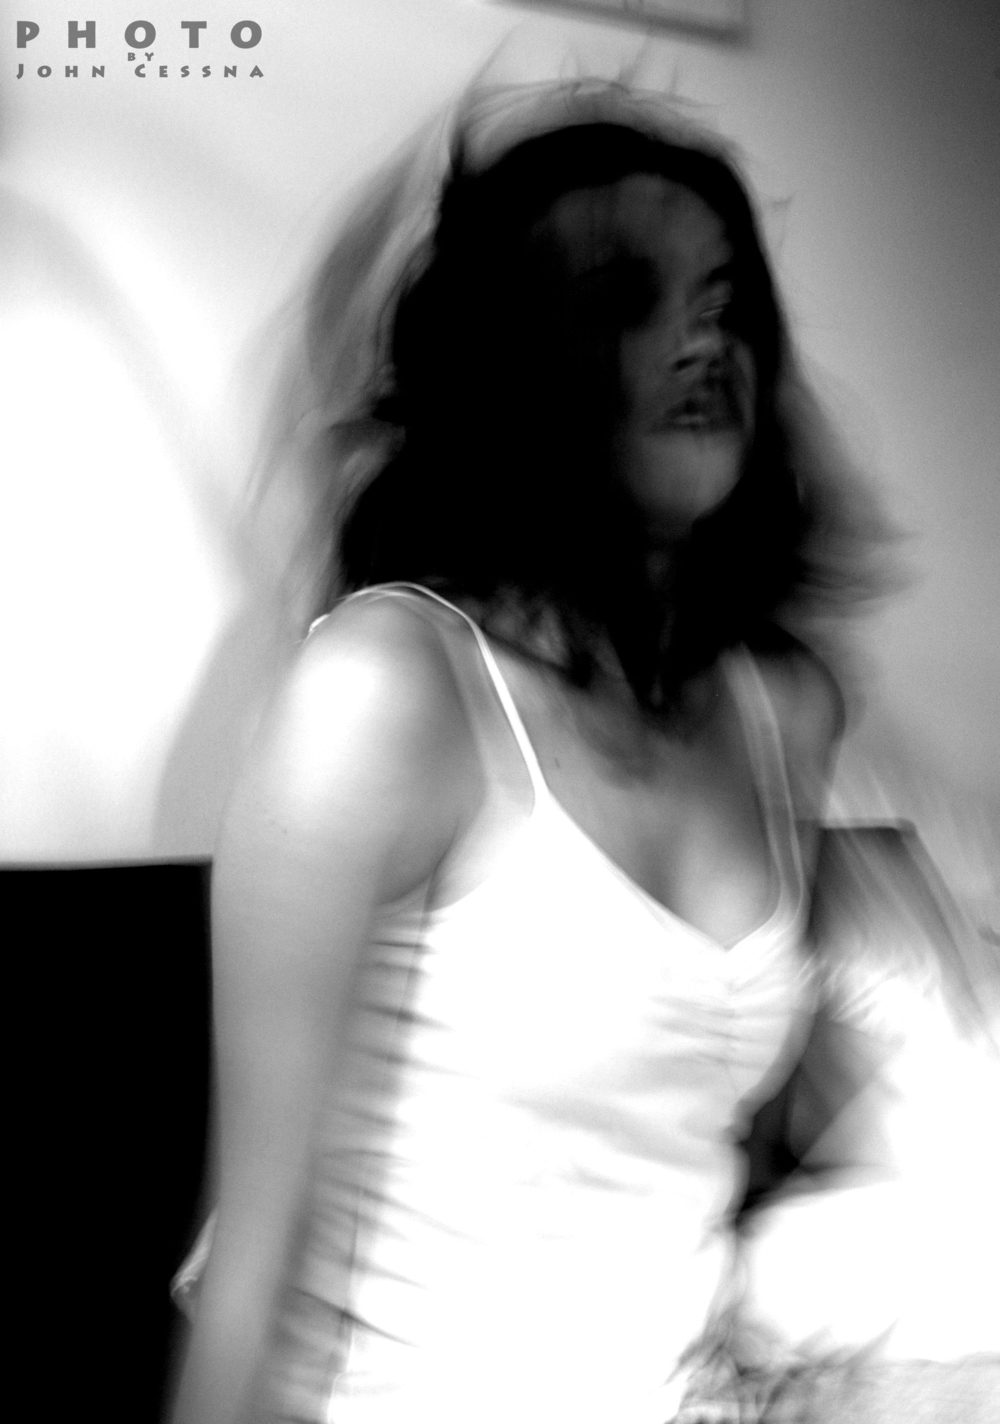 Kat+Wakes+Up+5+%28Vert%2C+Motion%2C+-1924850778-O.jpg